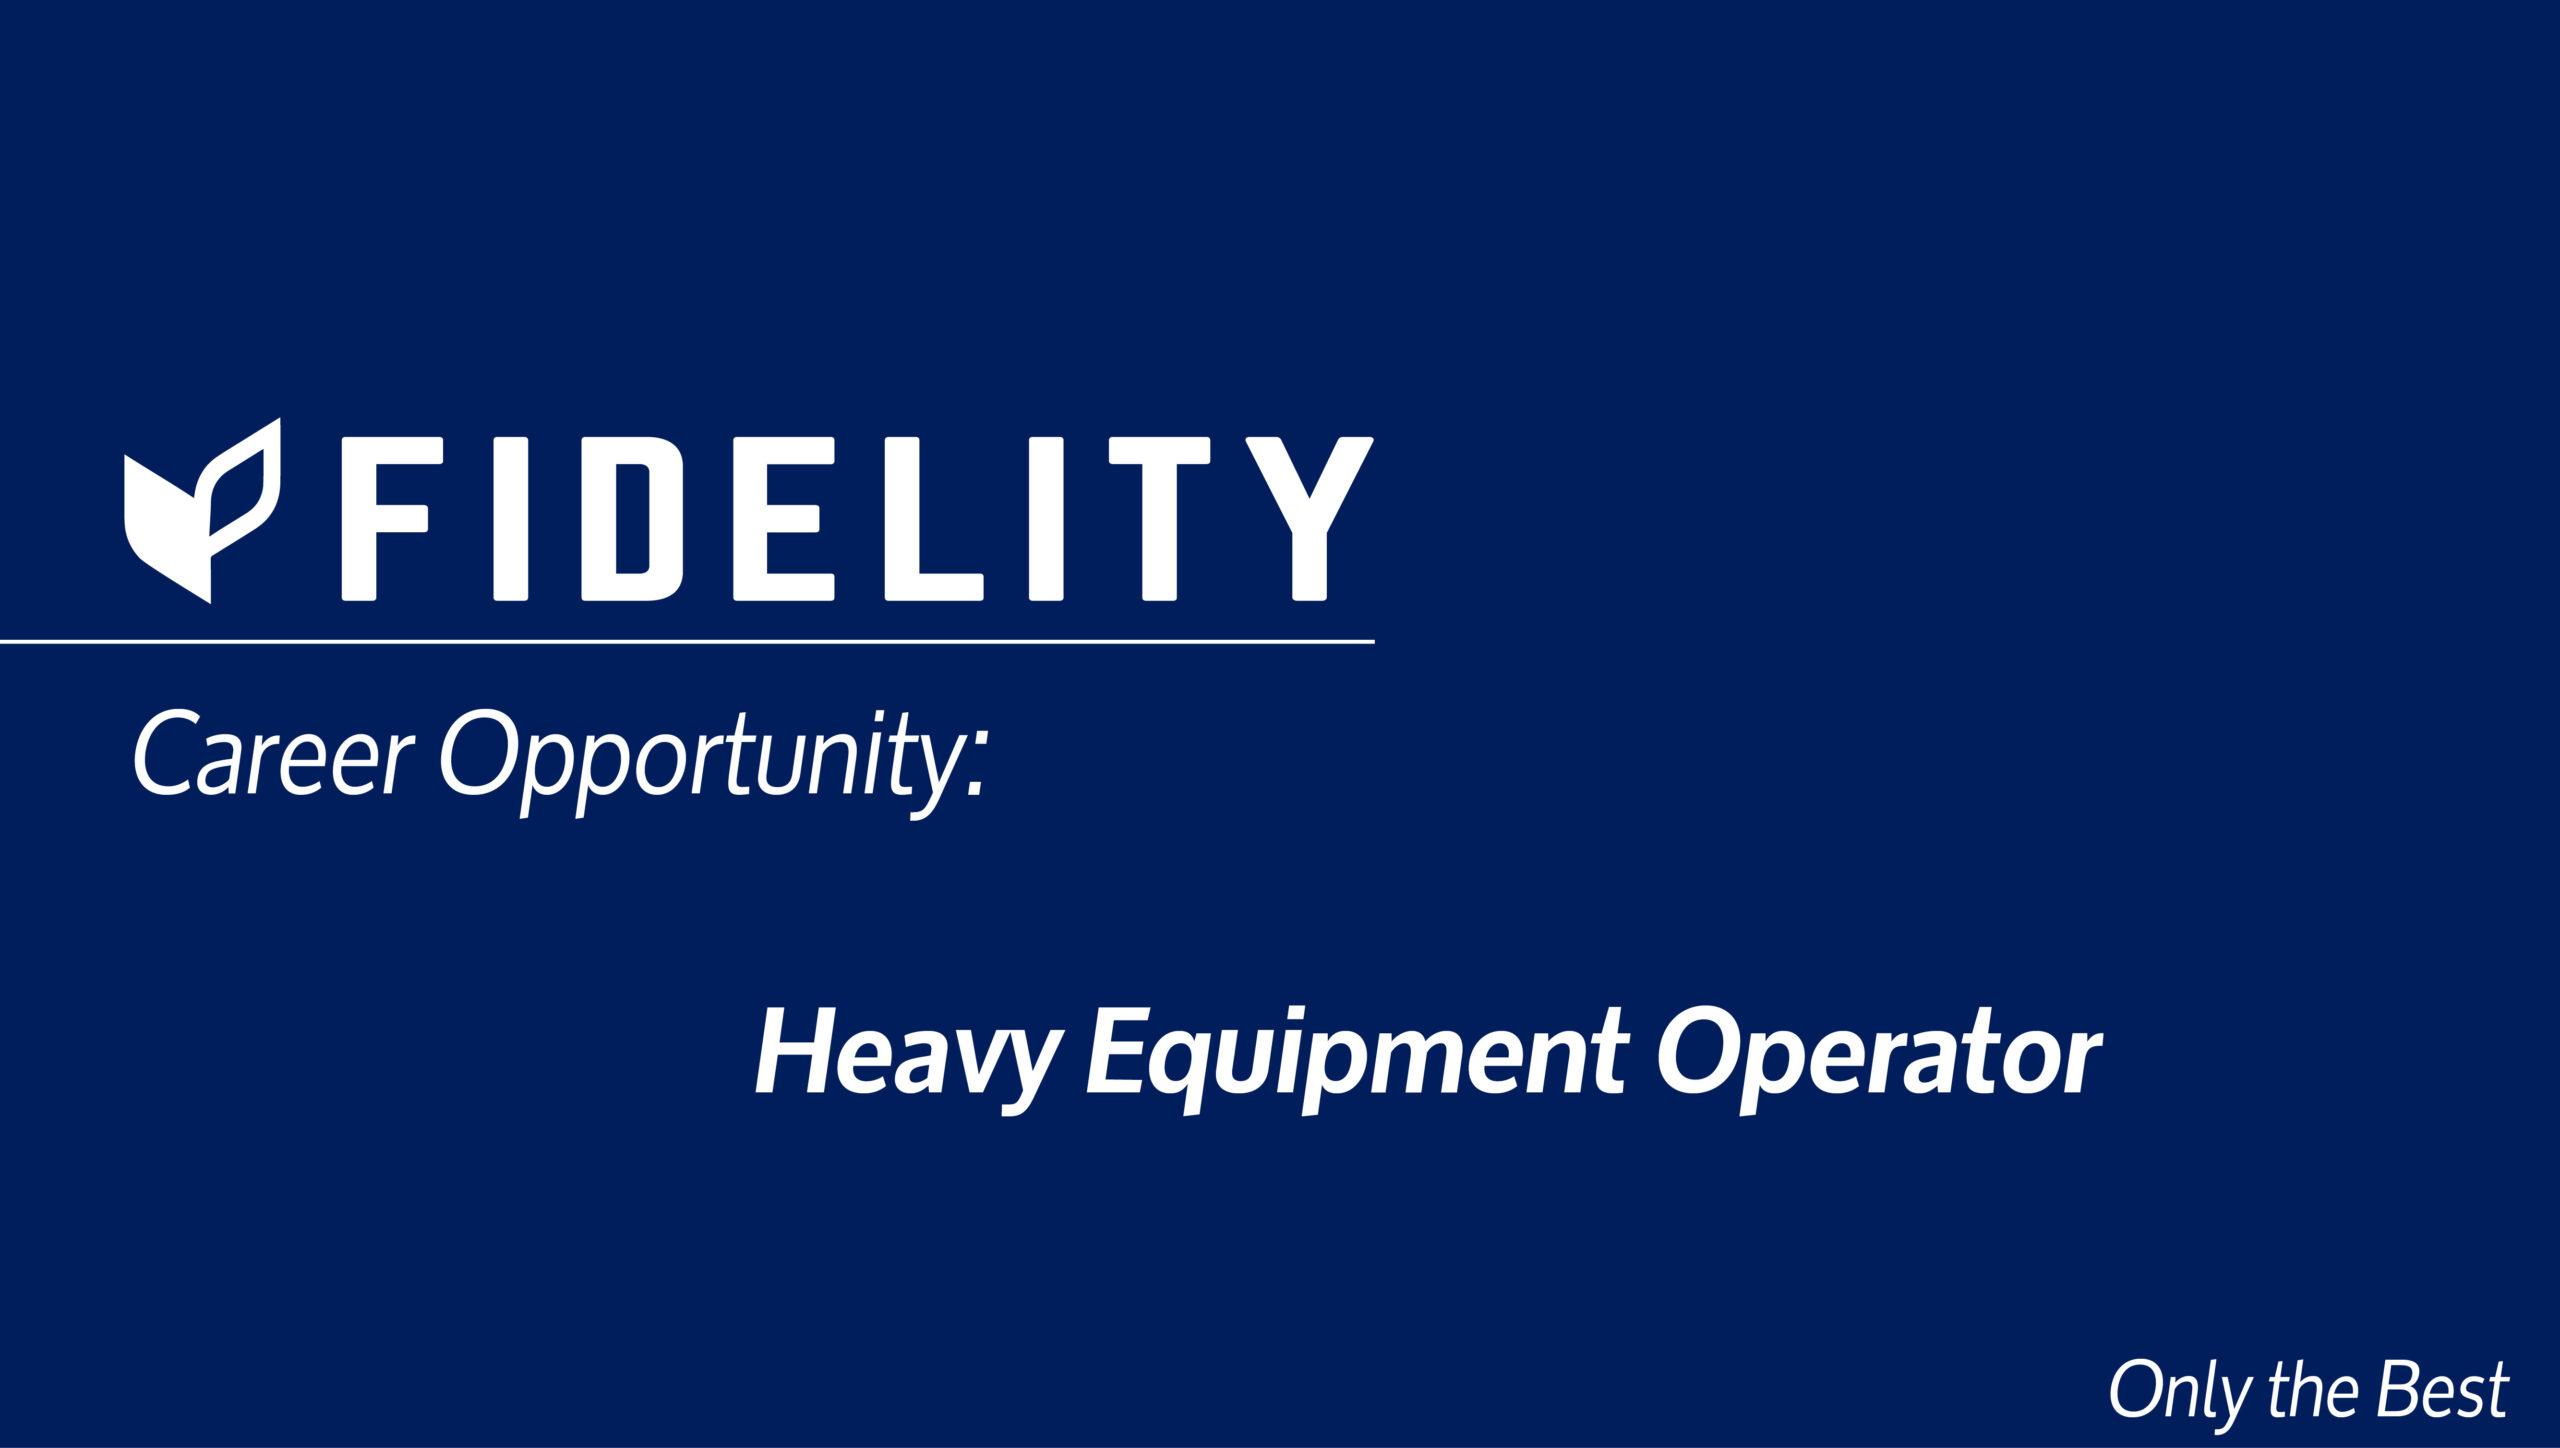 Career Opportunity: Heavy Equipment Operator